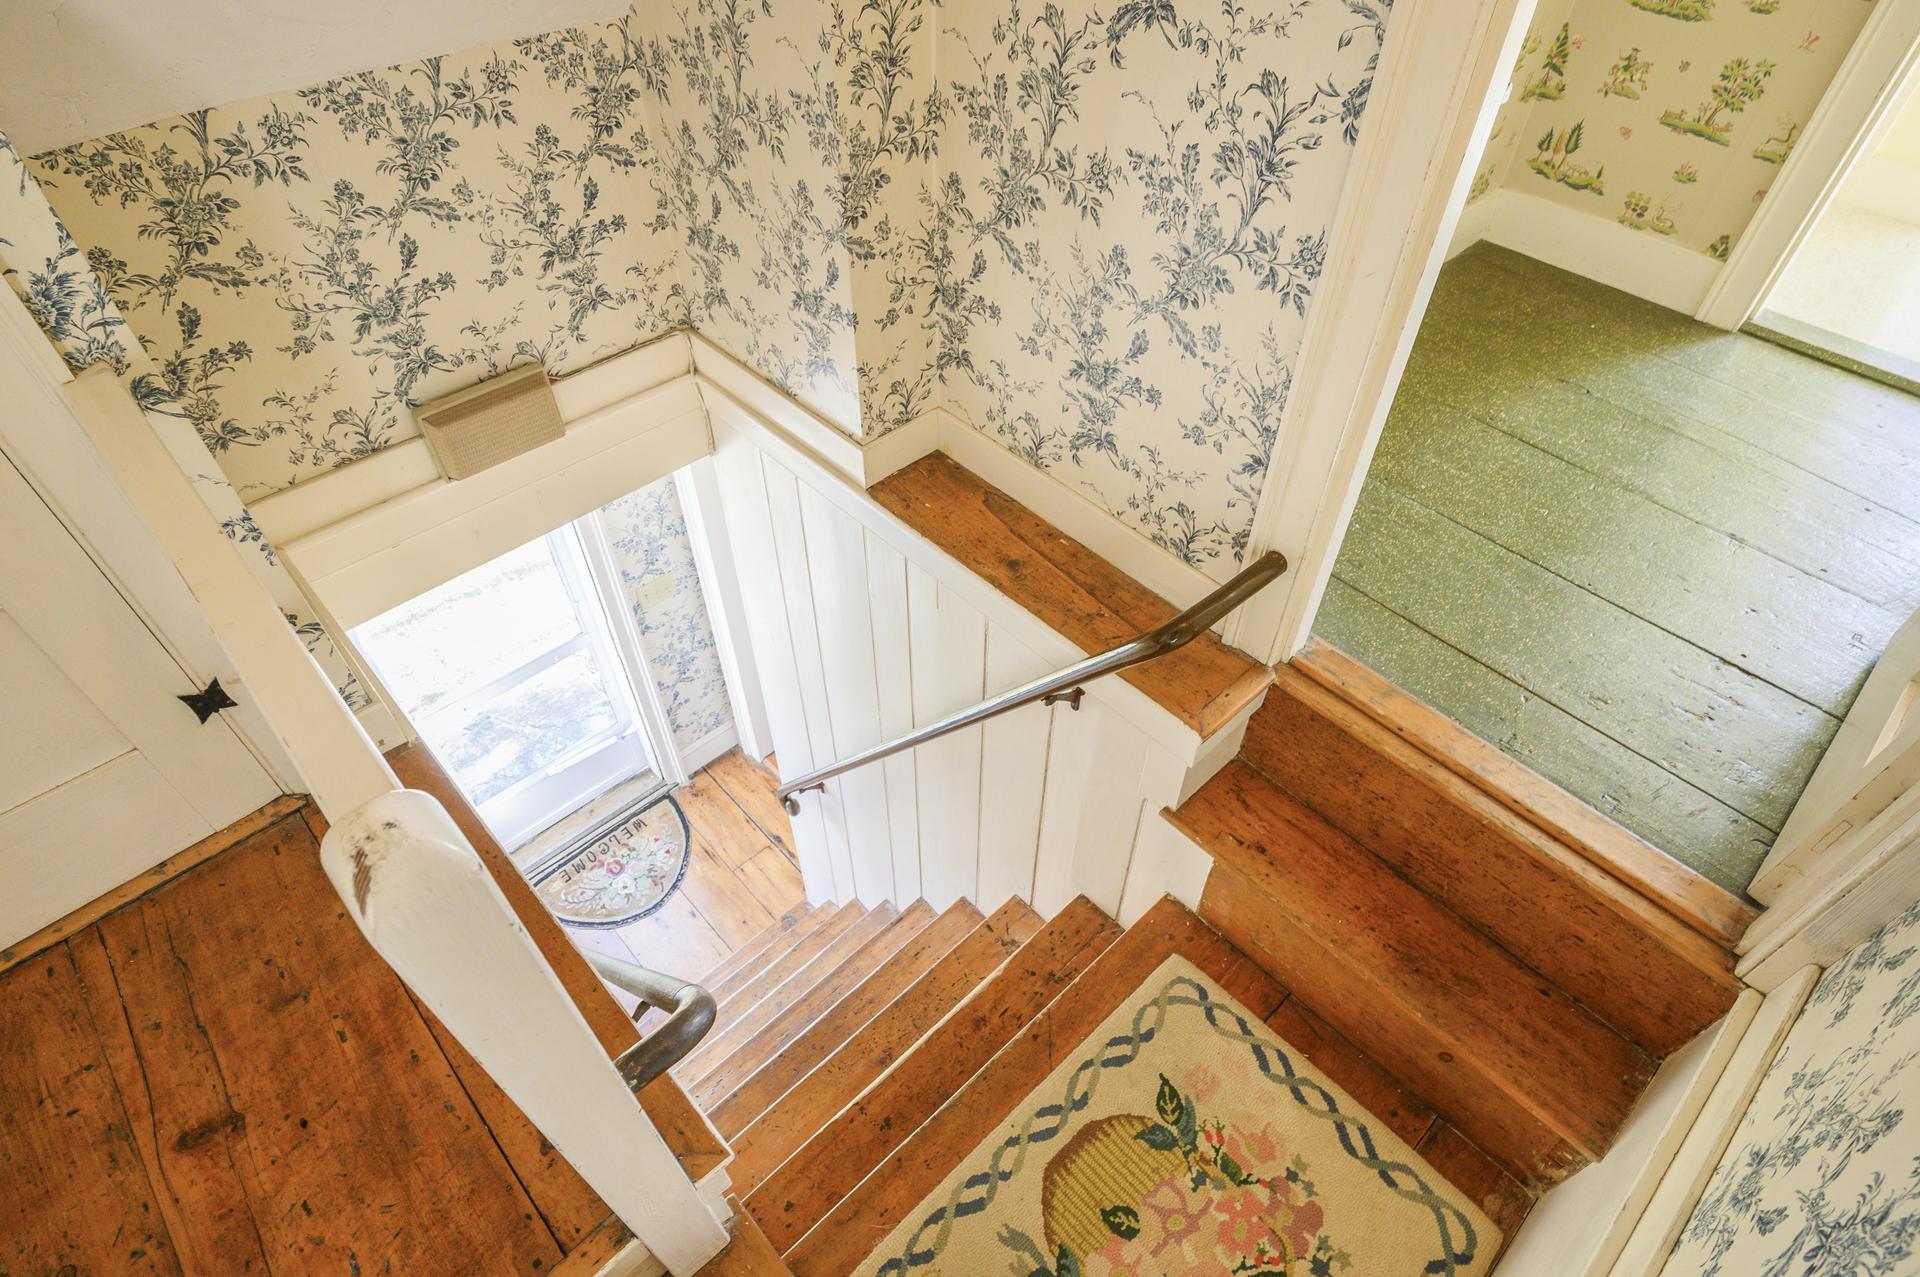 268 cedar street chatham ma 02633 property image 35